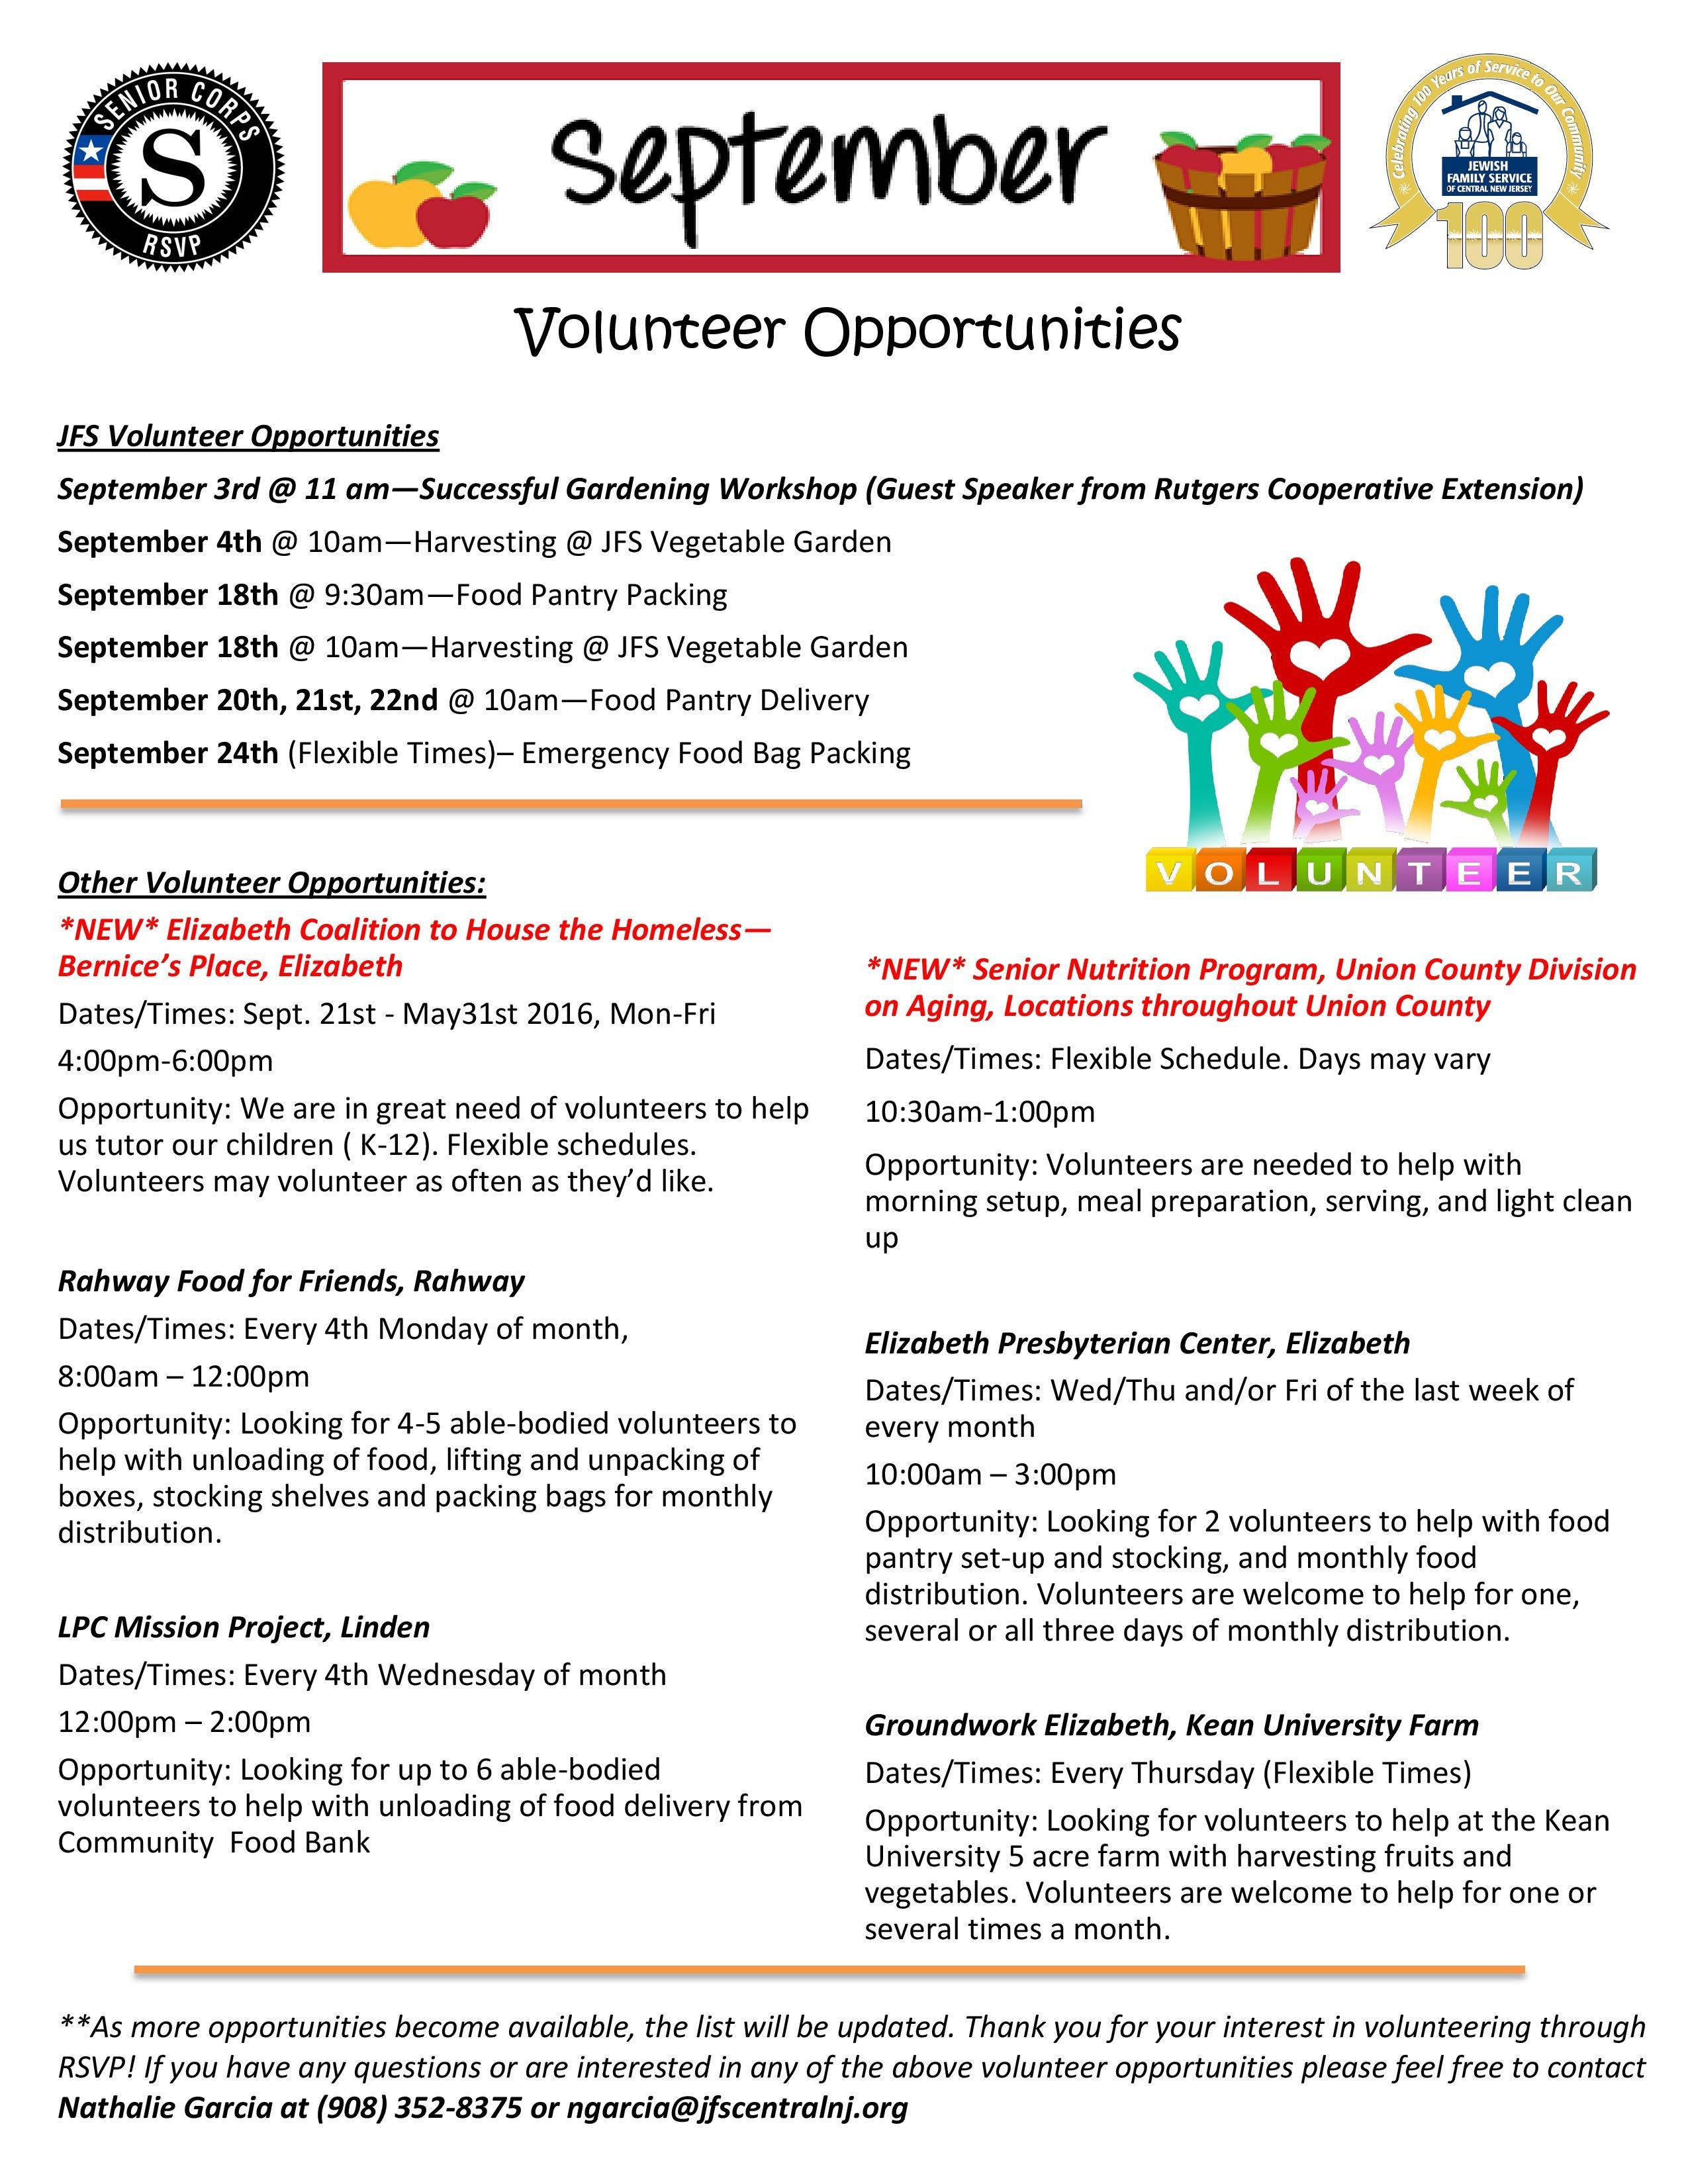 3bd344282db5c581b2d6_September_Volunteer_Opportunities-page-0.jpg